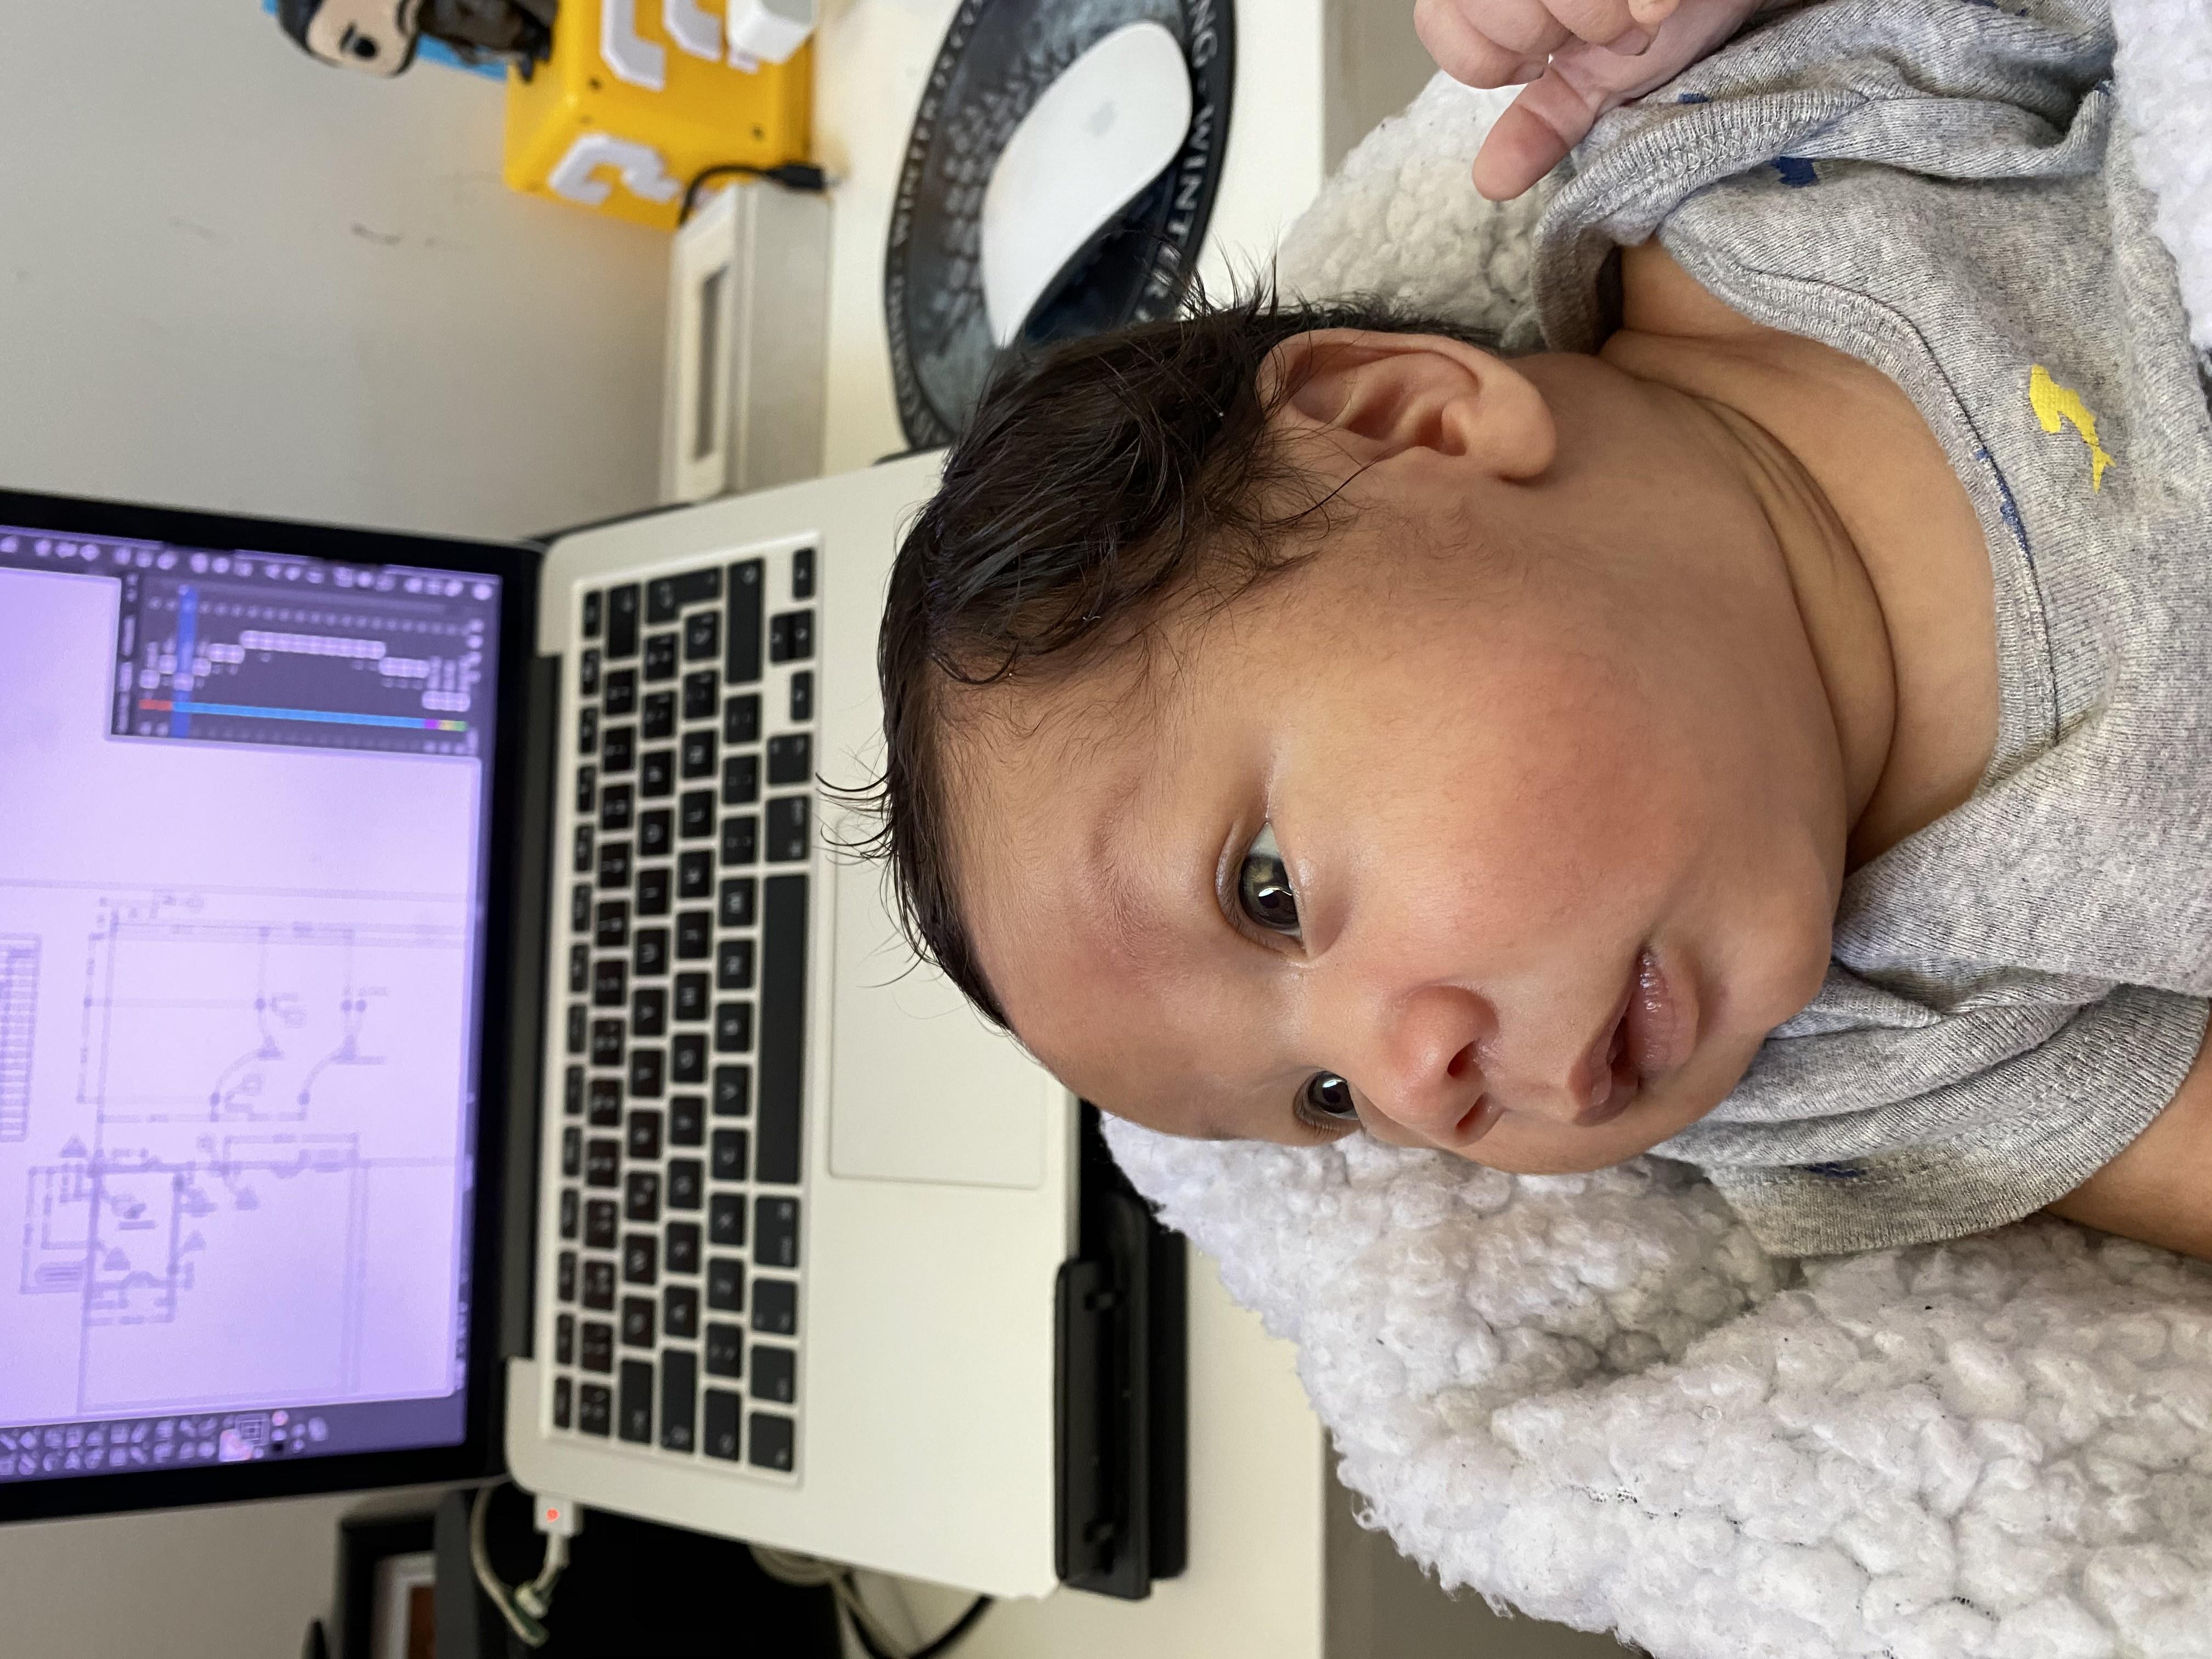 Work break with my son